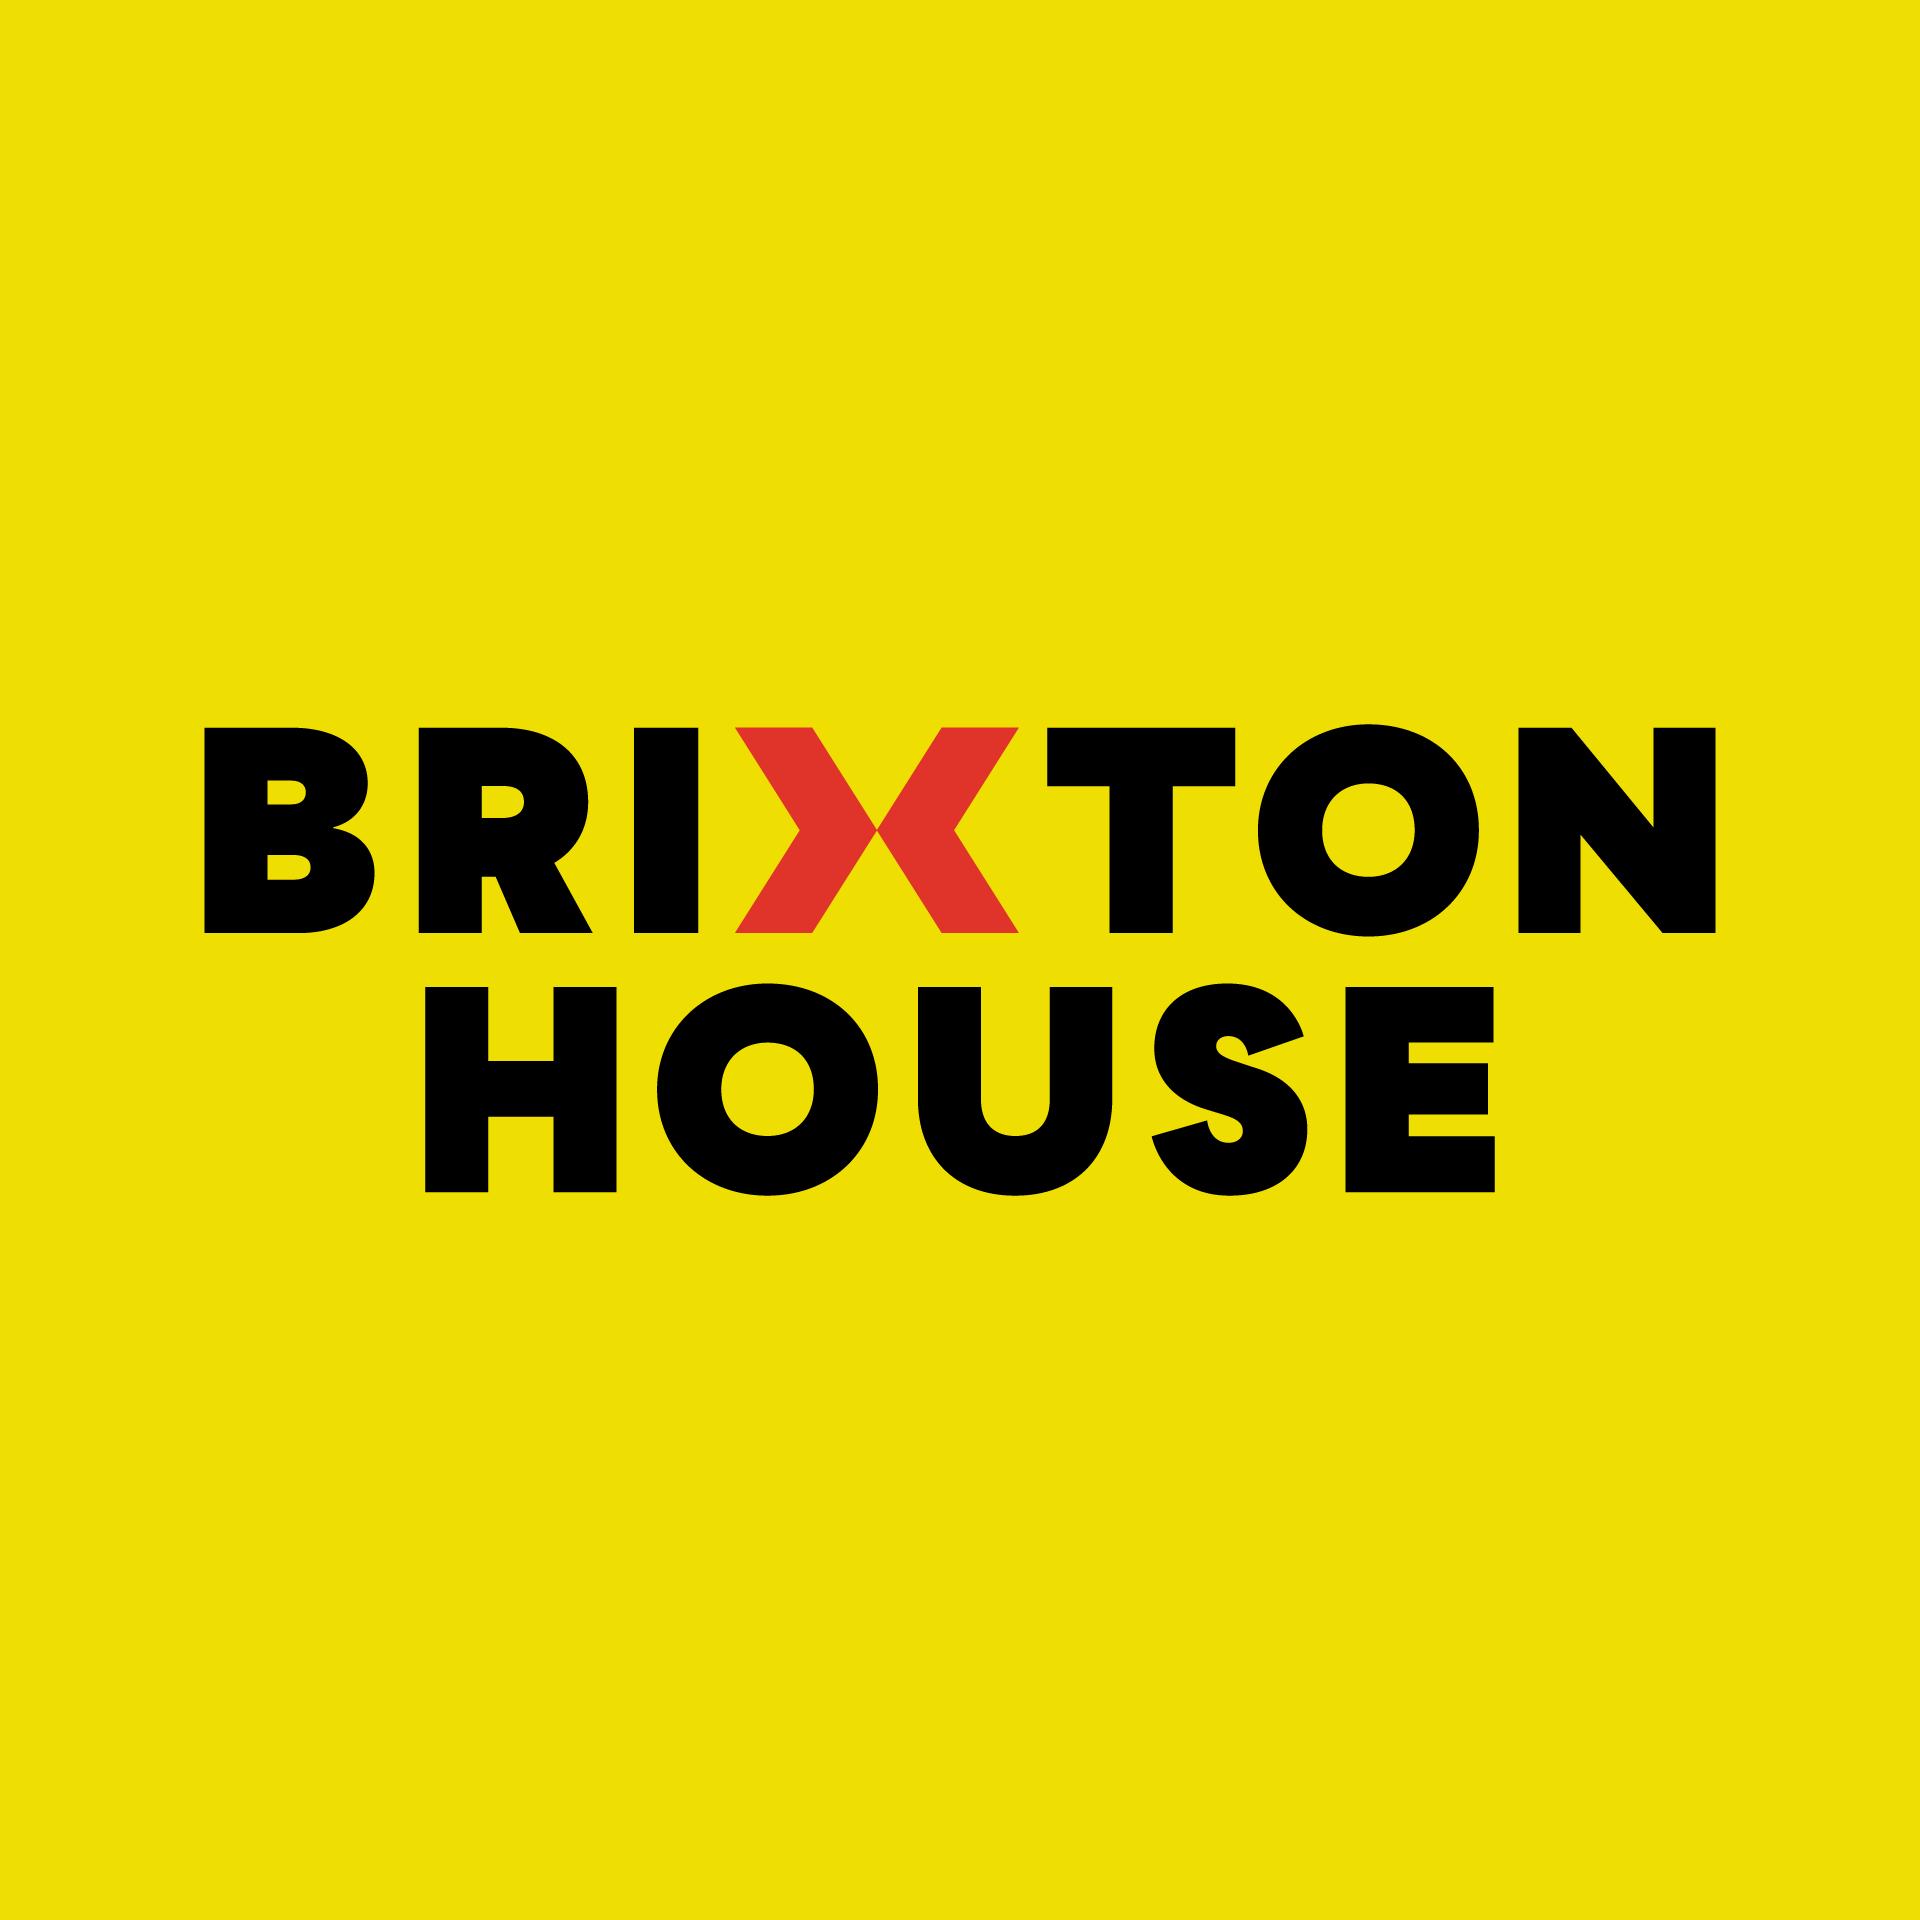 Brixton House logo